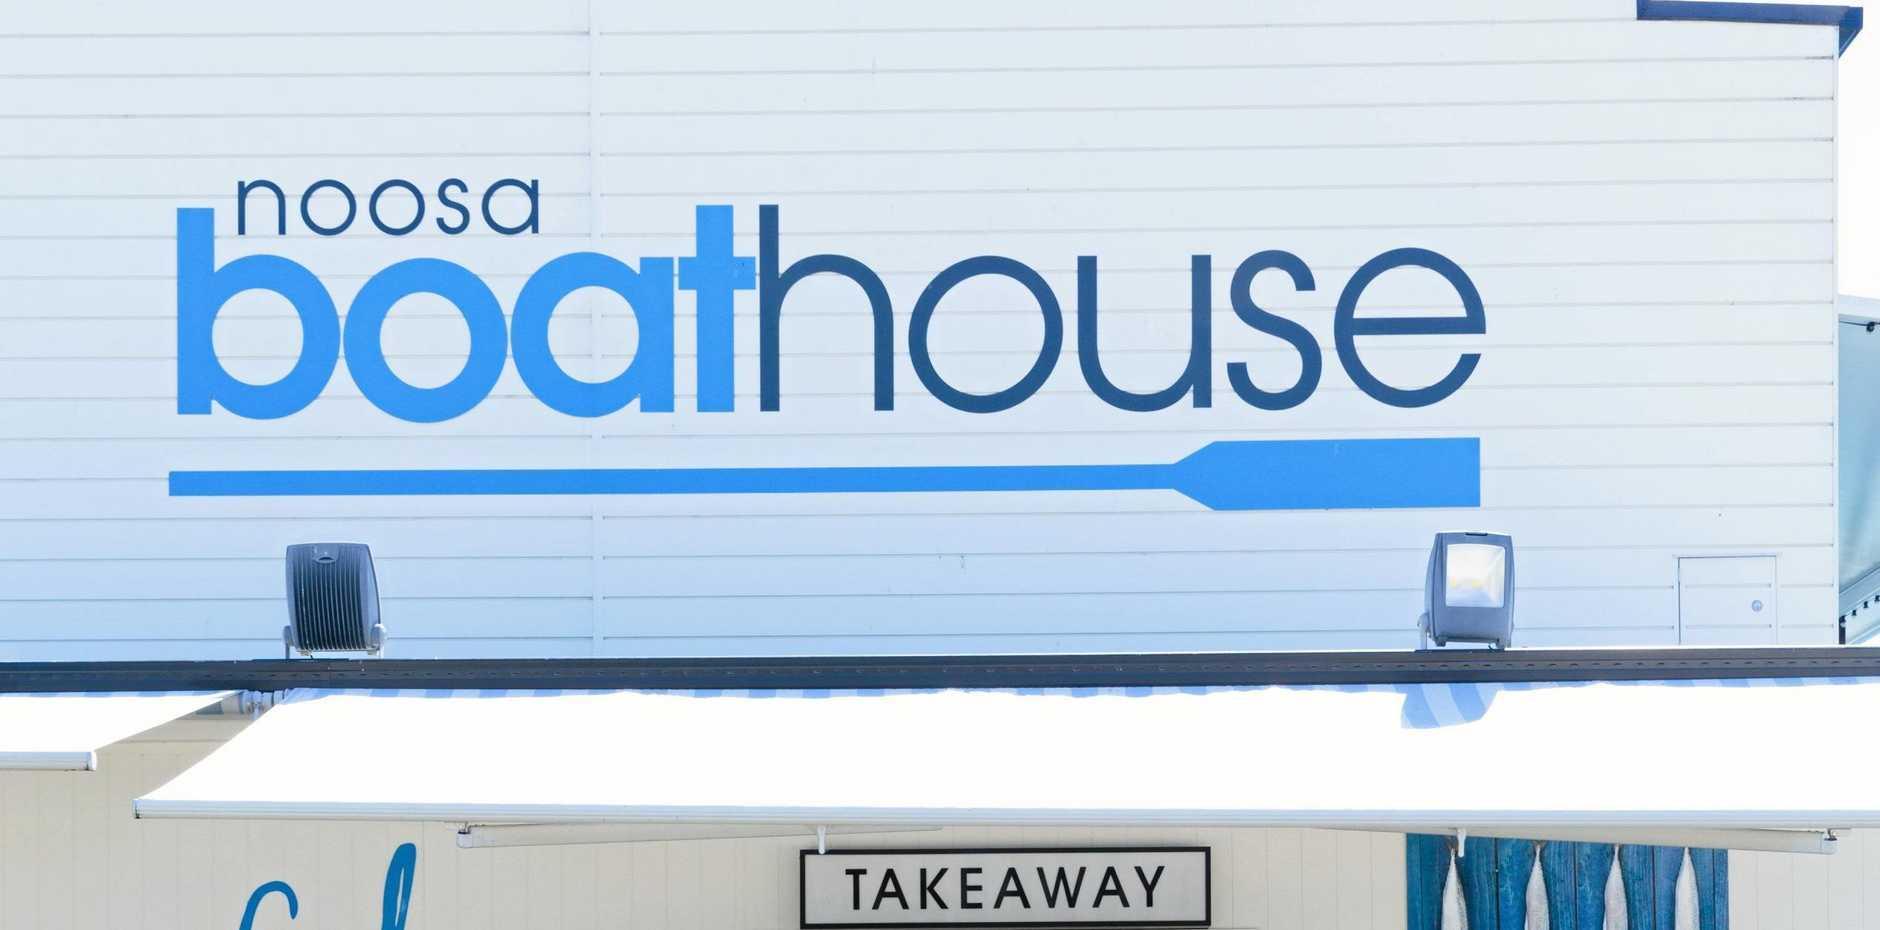 Noosa Boathouse